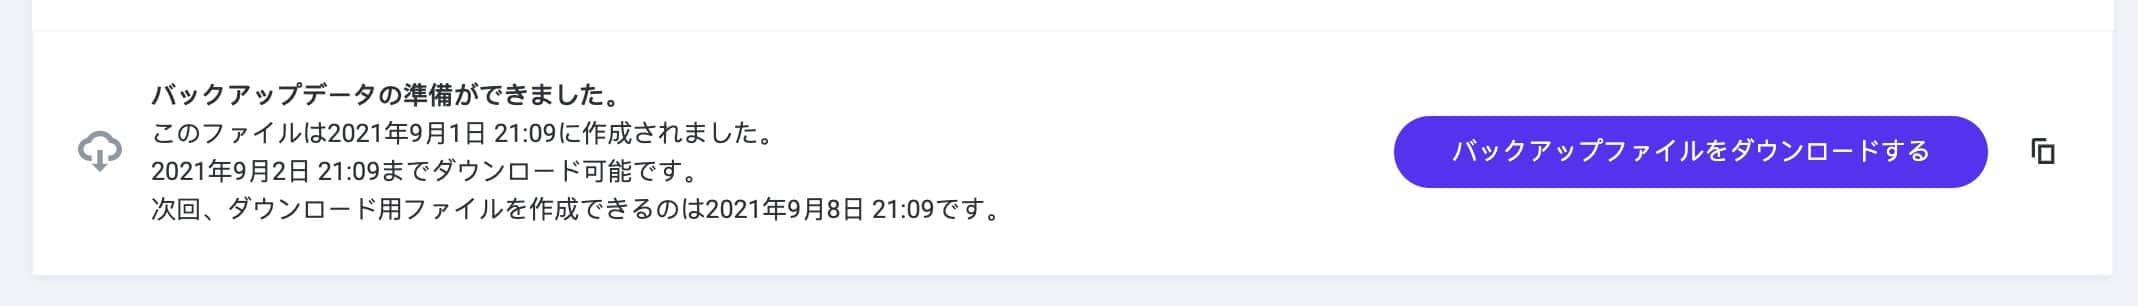 DevKinstaバックアップのダウンロード